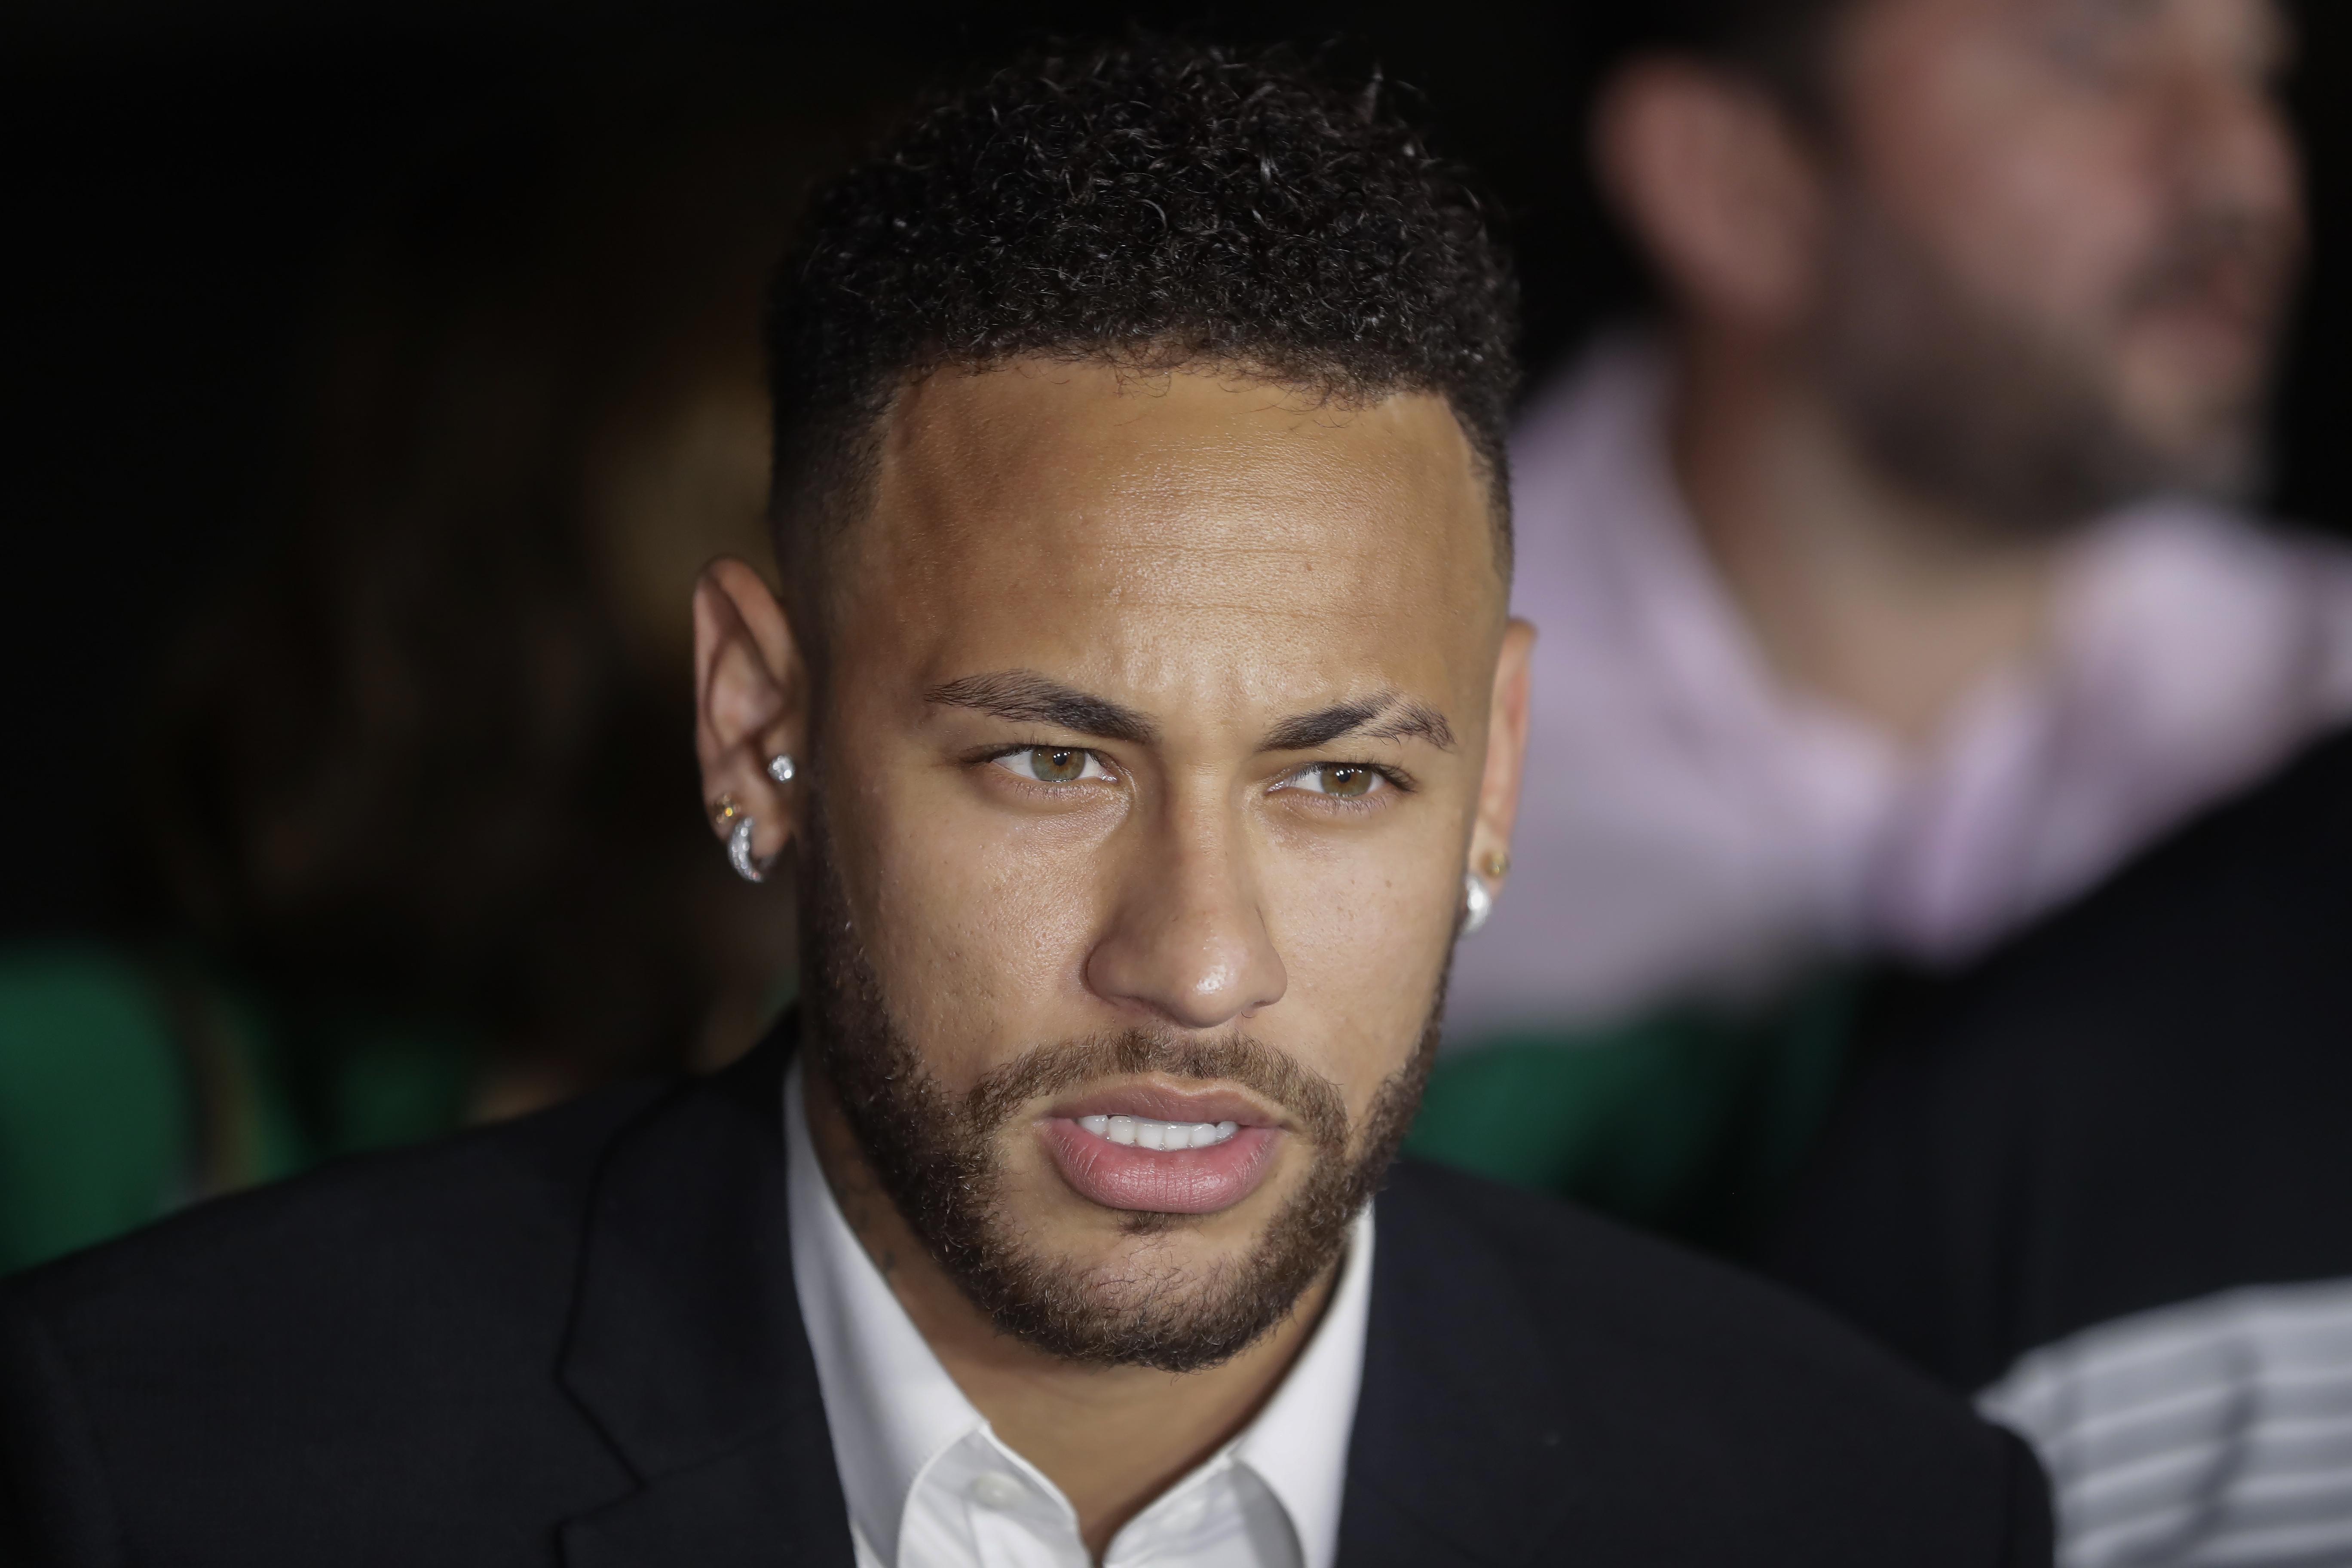 Barcelona official denies club wants Neymar to return